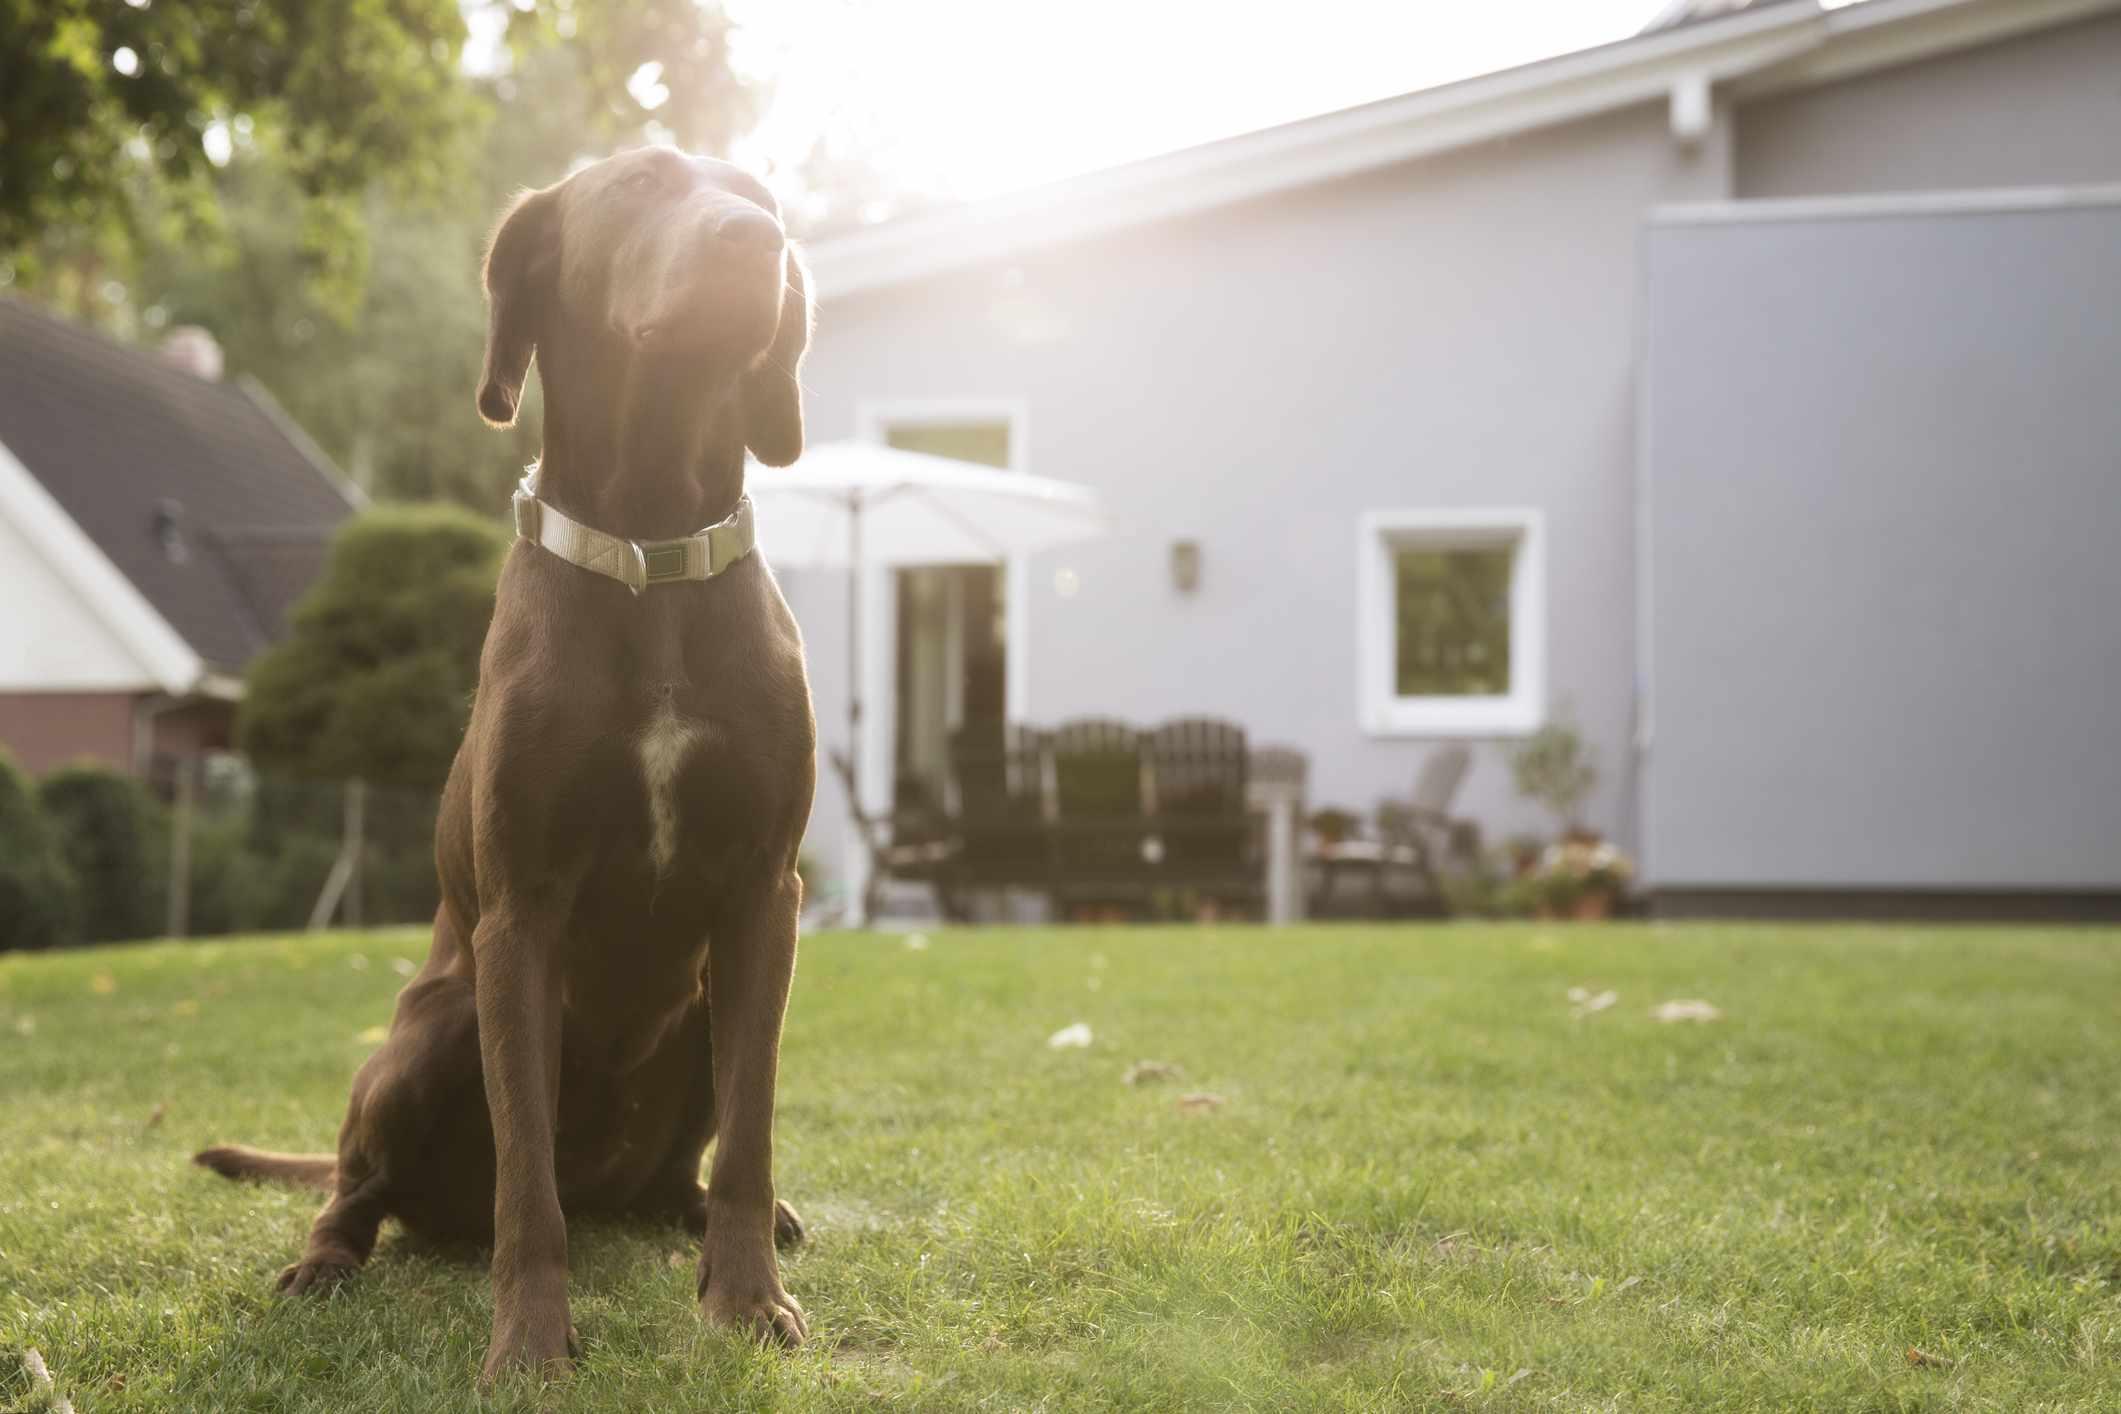 Big brown dog sitting in grass in backyard.